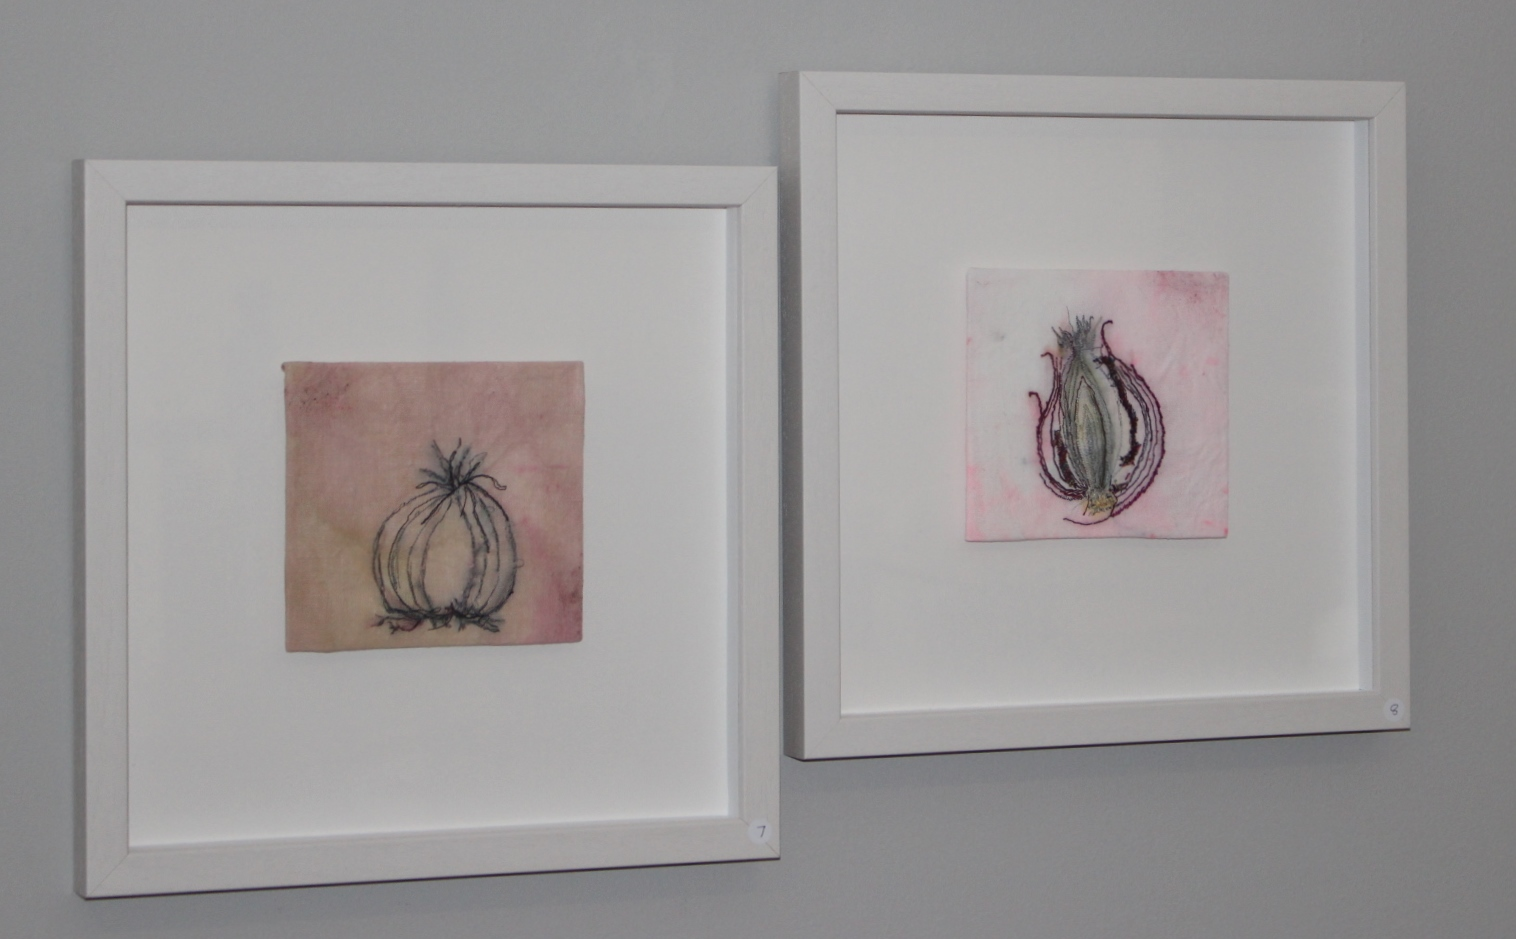 Onion II and Onion III, Rina Whyte, element15